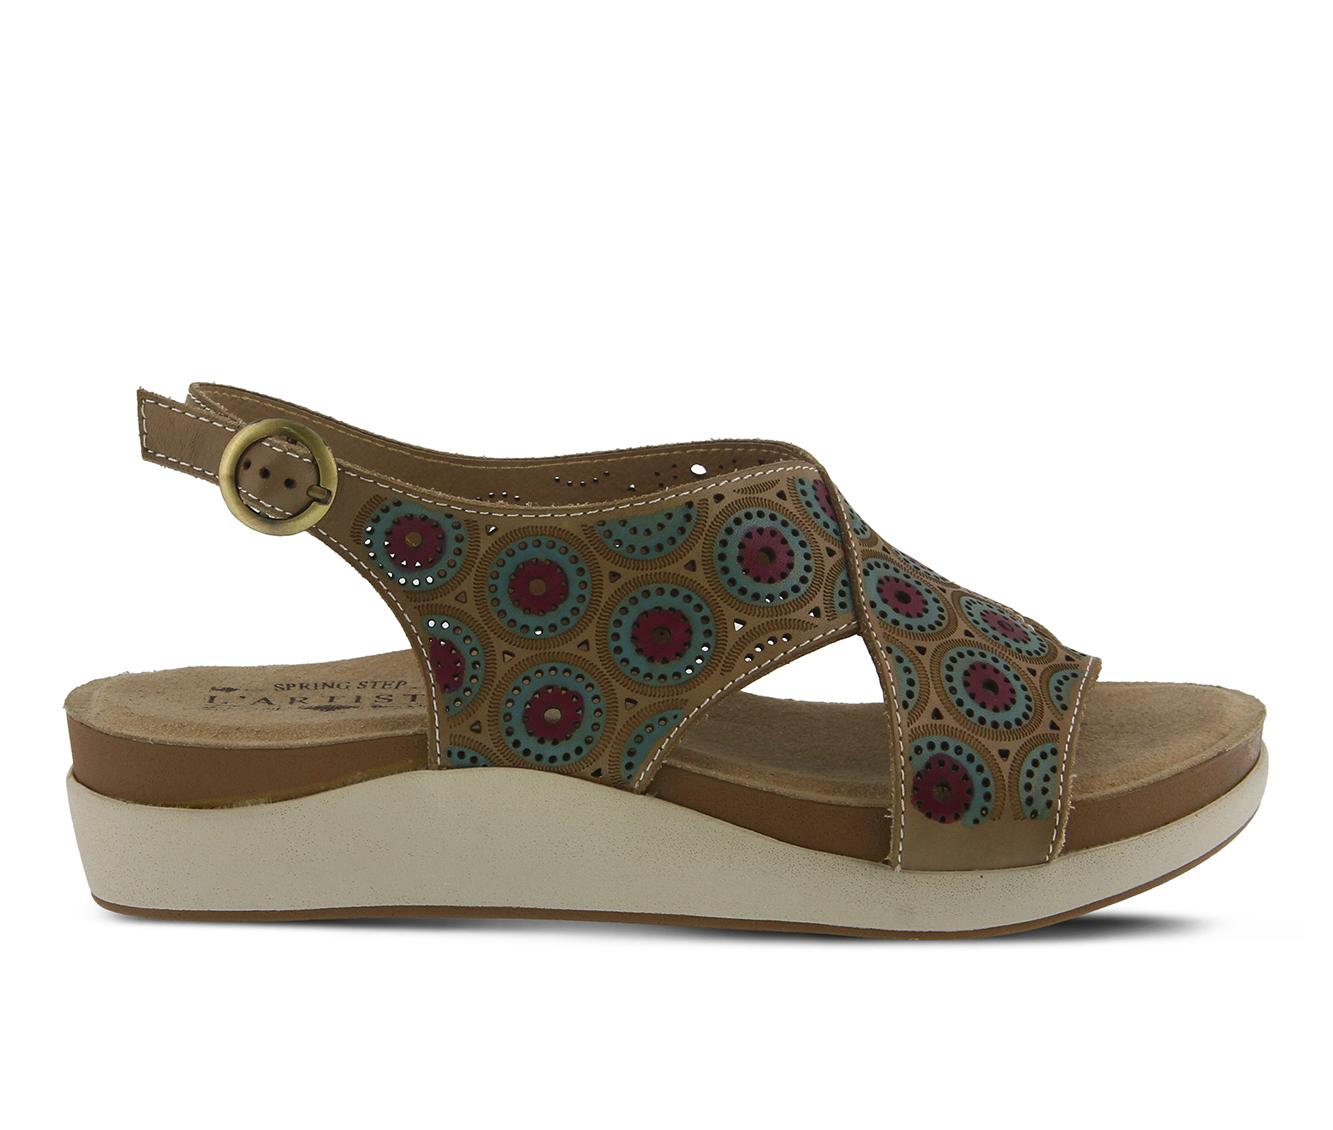 L'Artiste Erice Women's Sandal (Beige Leather)